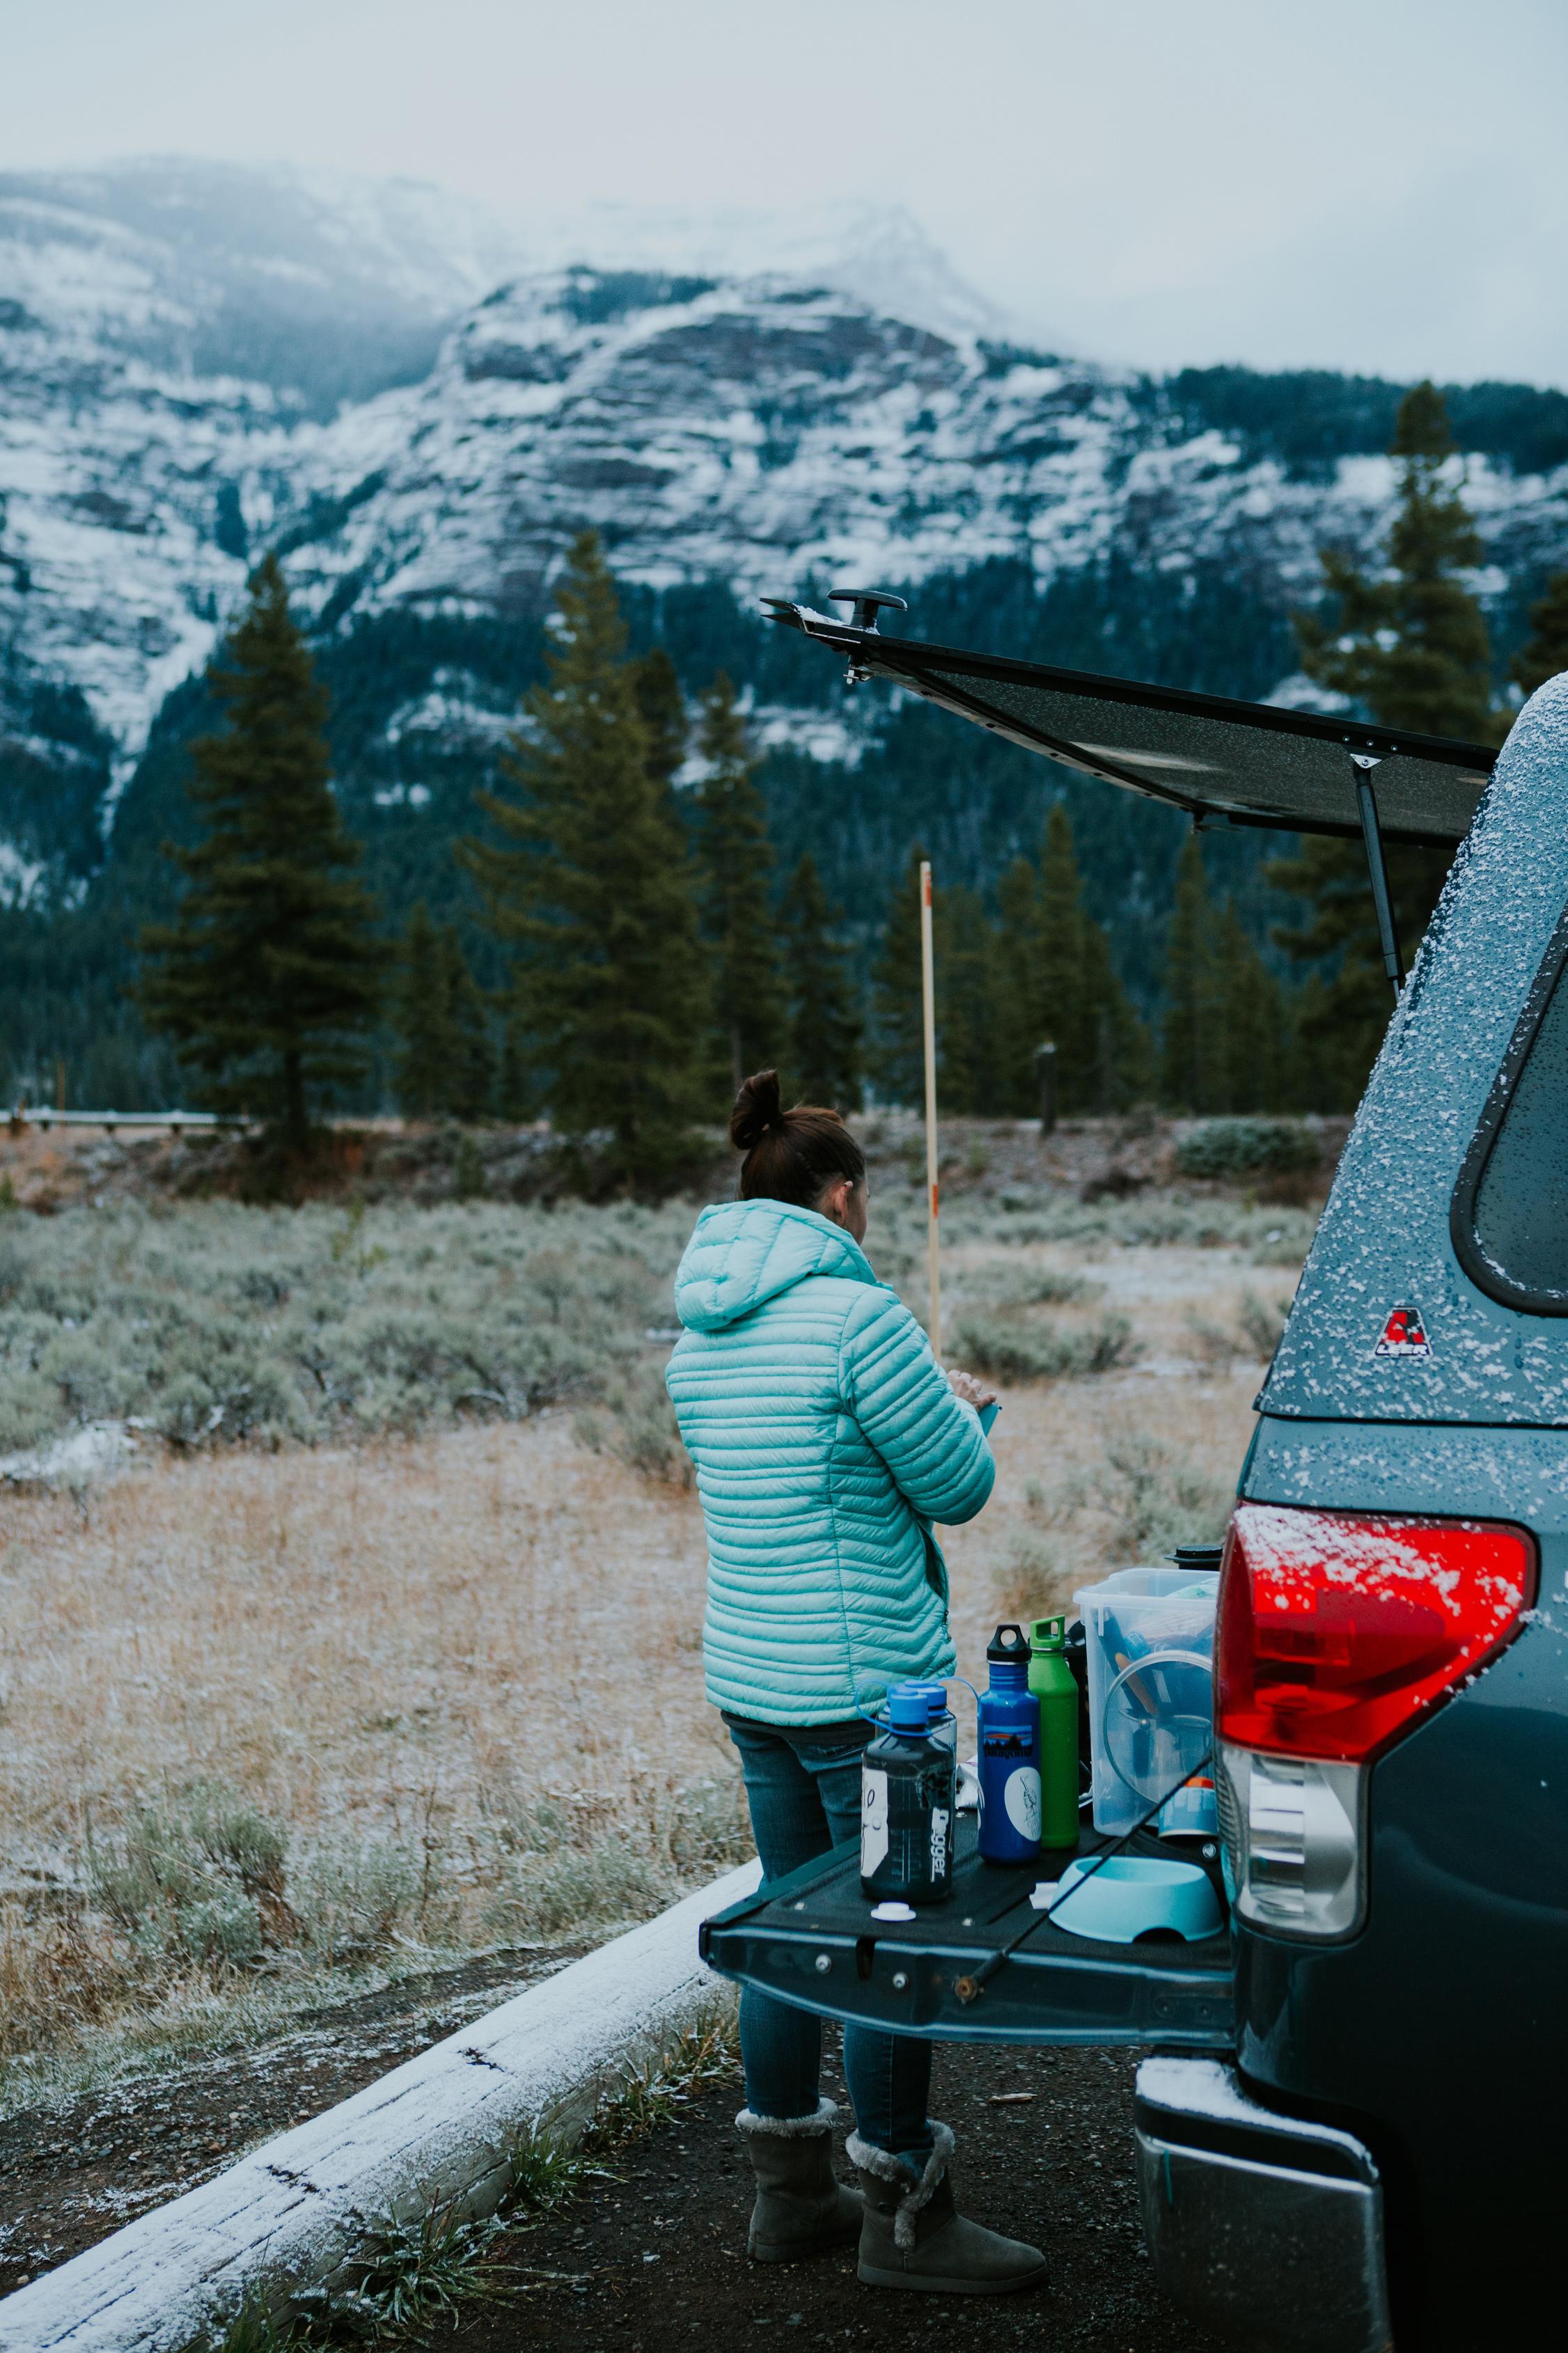 CindyGiovagnoli_outdoor_adventure_photography_Grand_Teton_Yellowstone_Glacier_National_Park_Montana_Wyoming_South_Dakota_Mount_Rushmore_Badlands-018.jpg